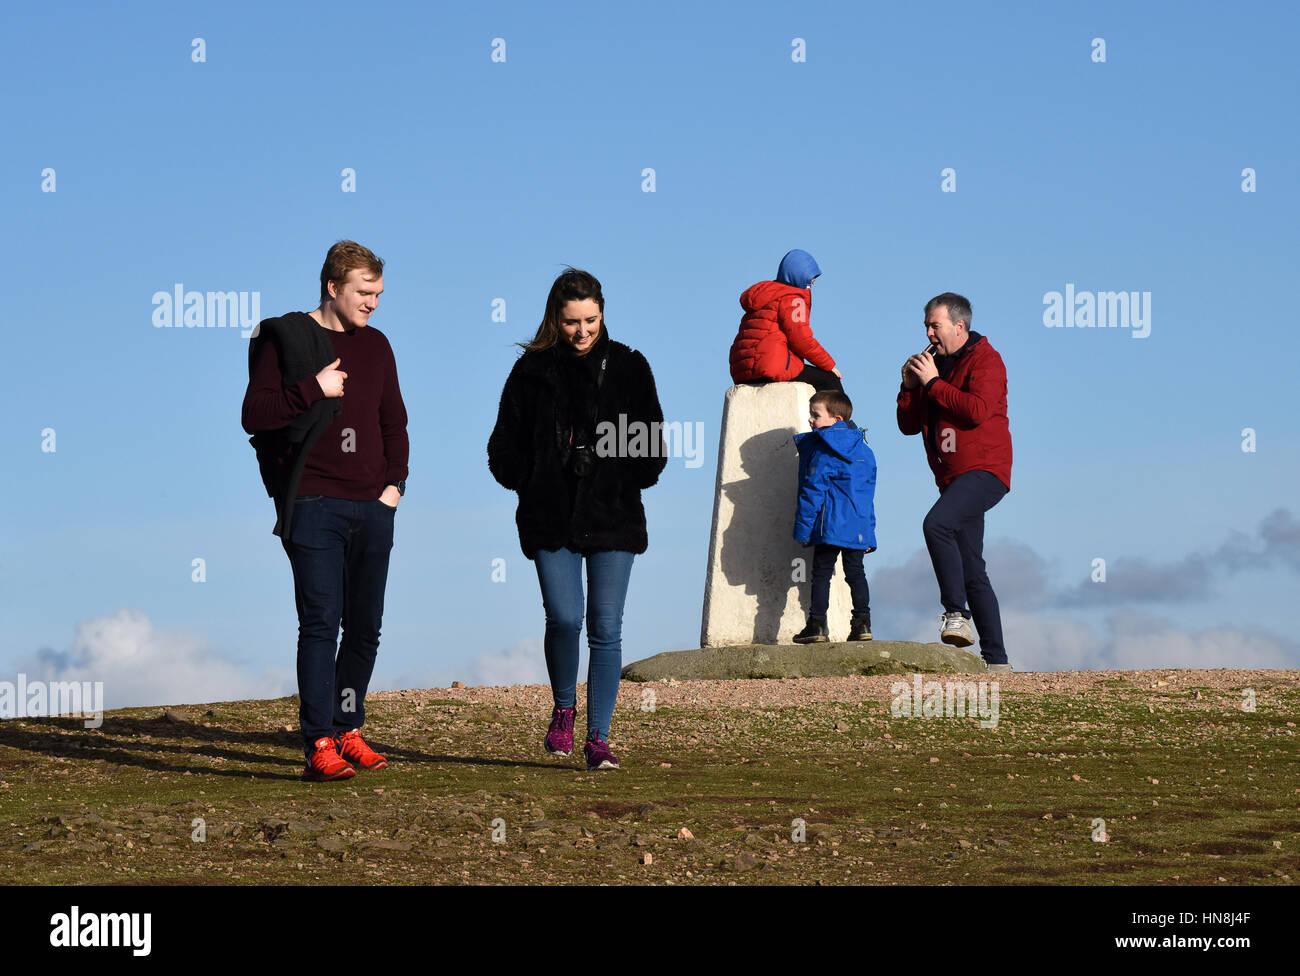 Walkers on the Wrekin Hill in Shropshire Uk - Stock Image